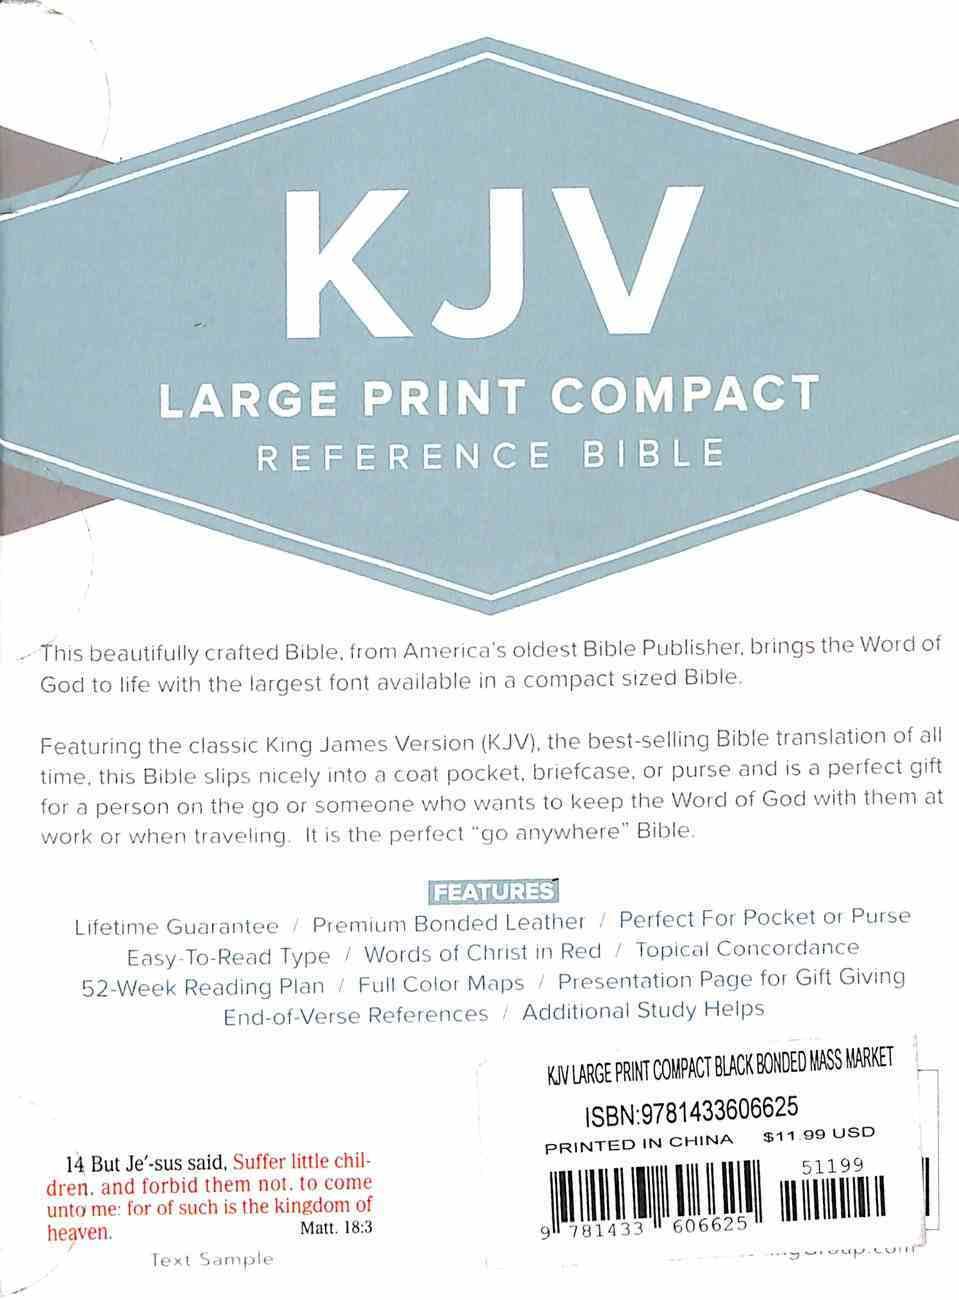 KJV Large Print Compact Bible Black Bonded Leather